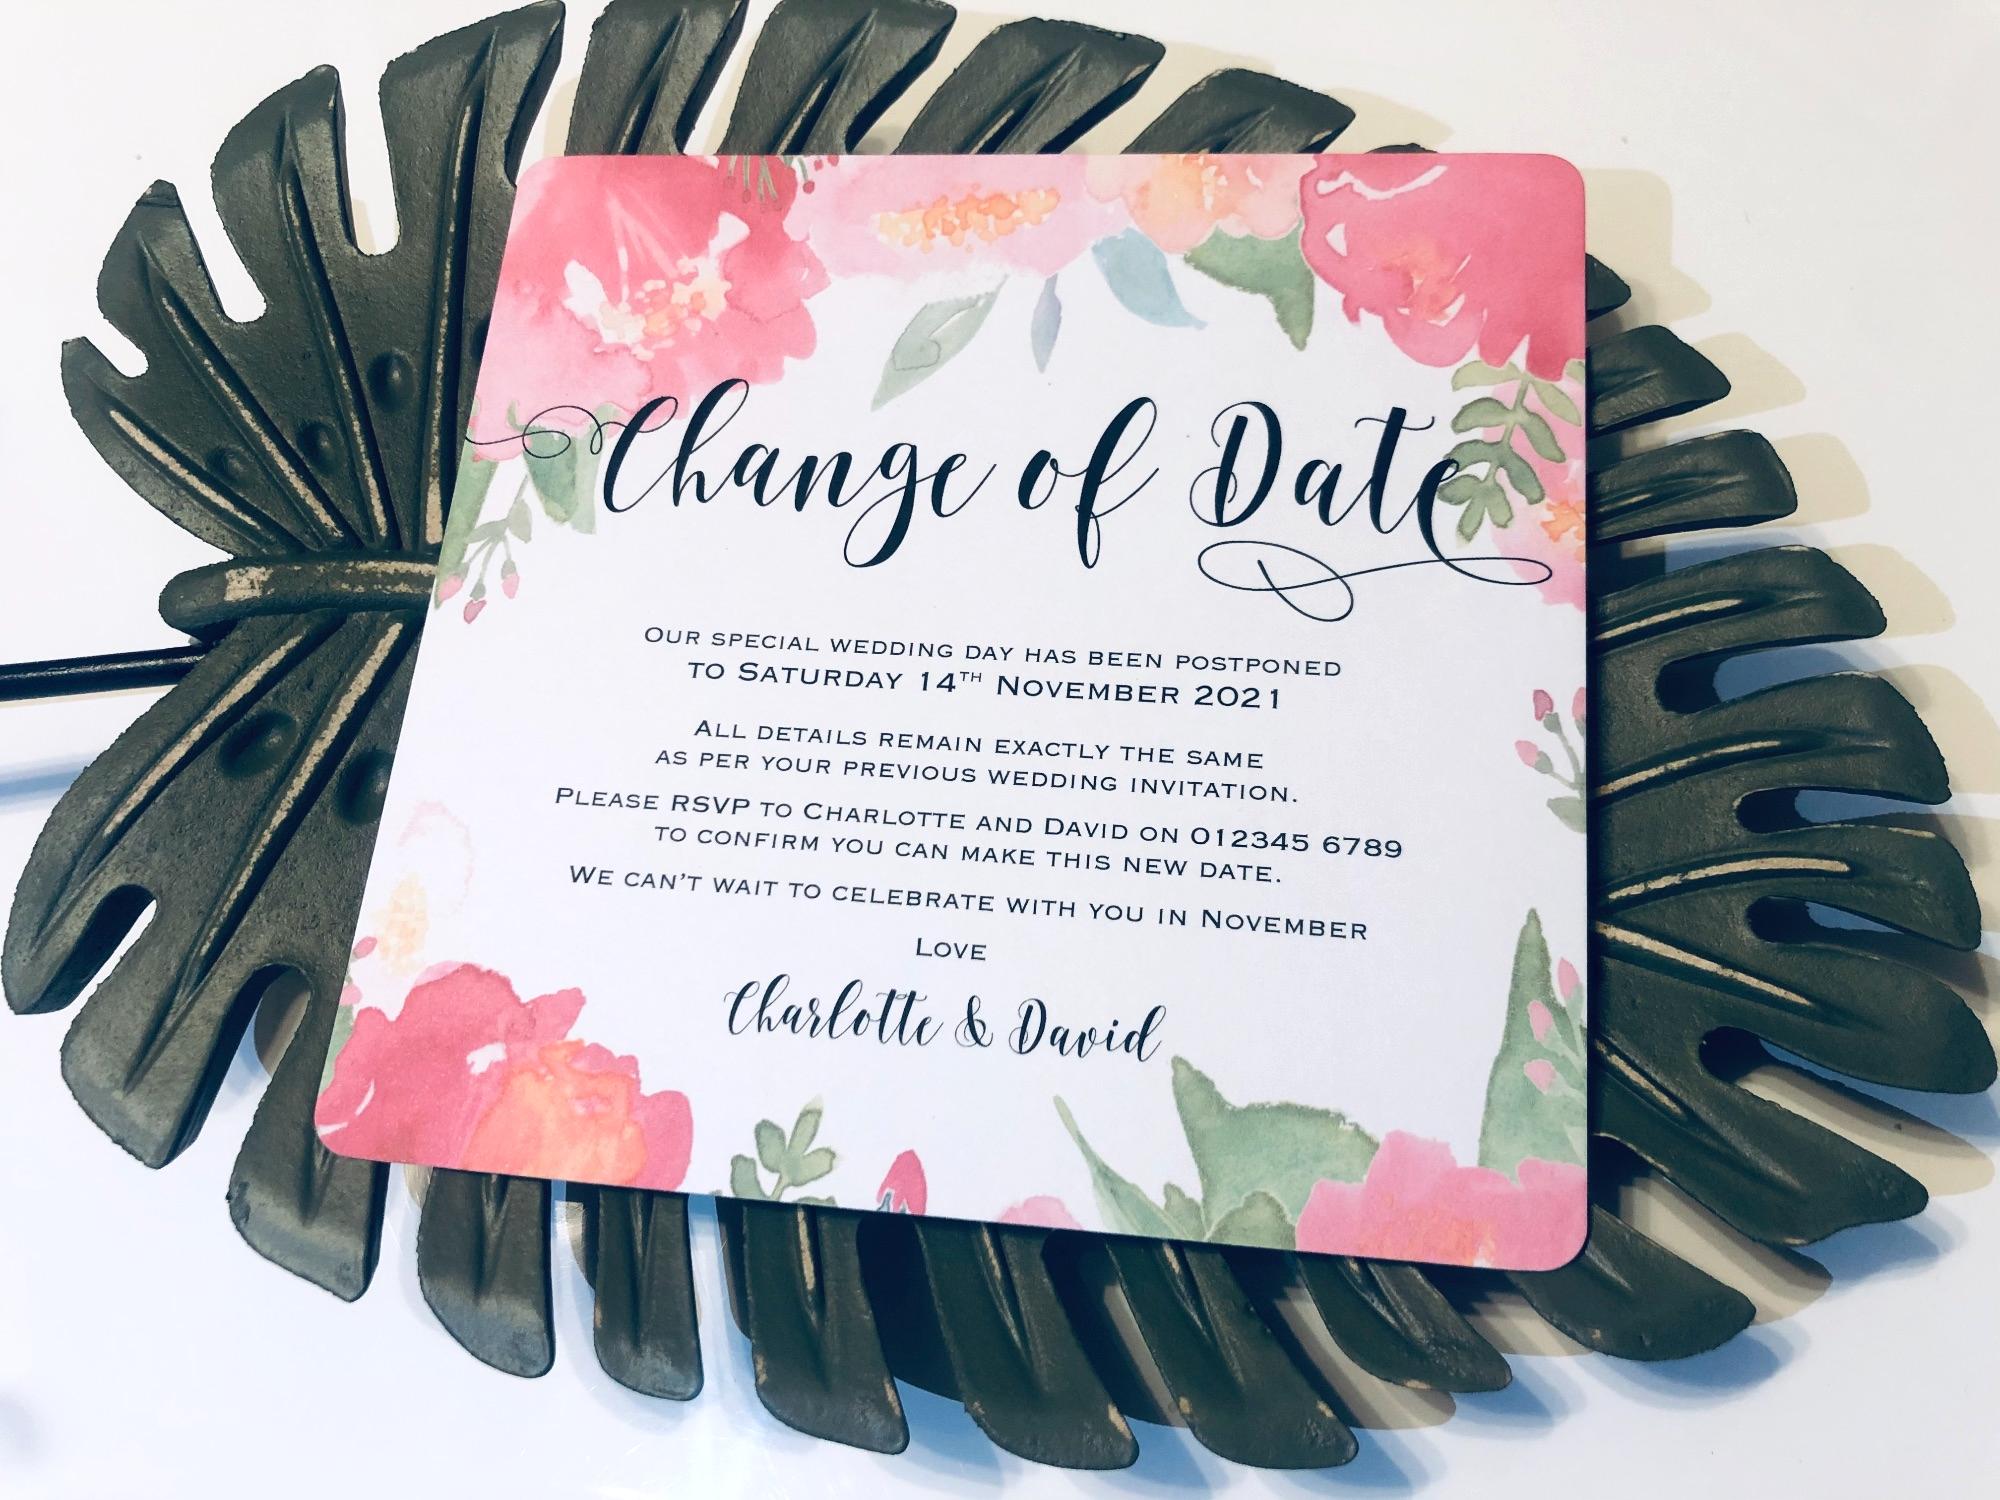 Change of date postponement cards